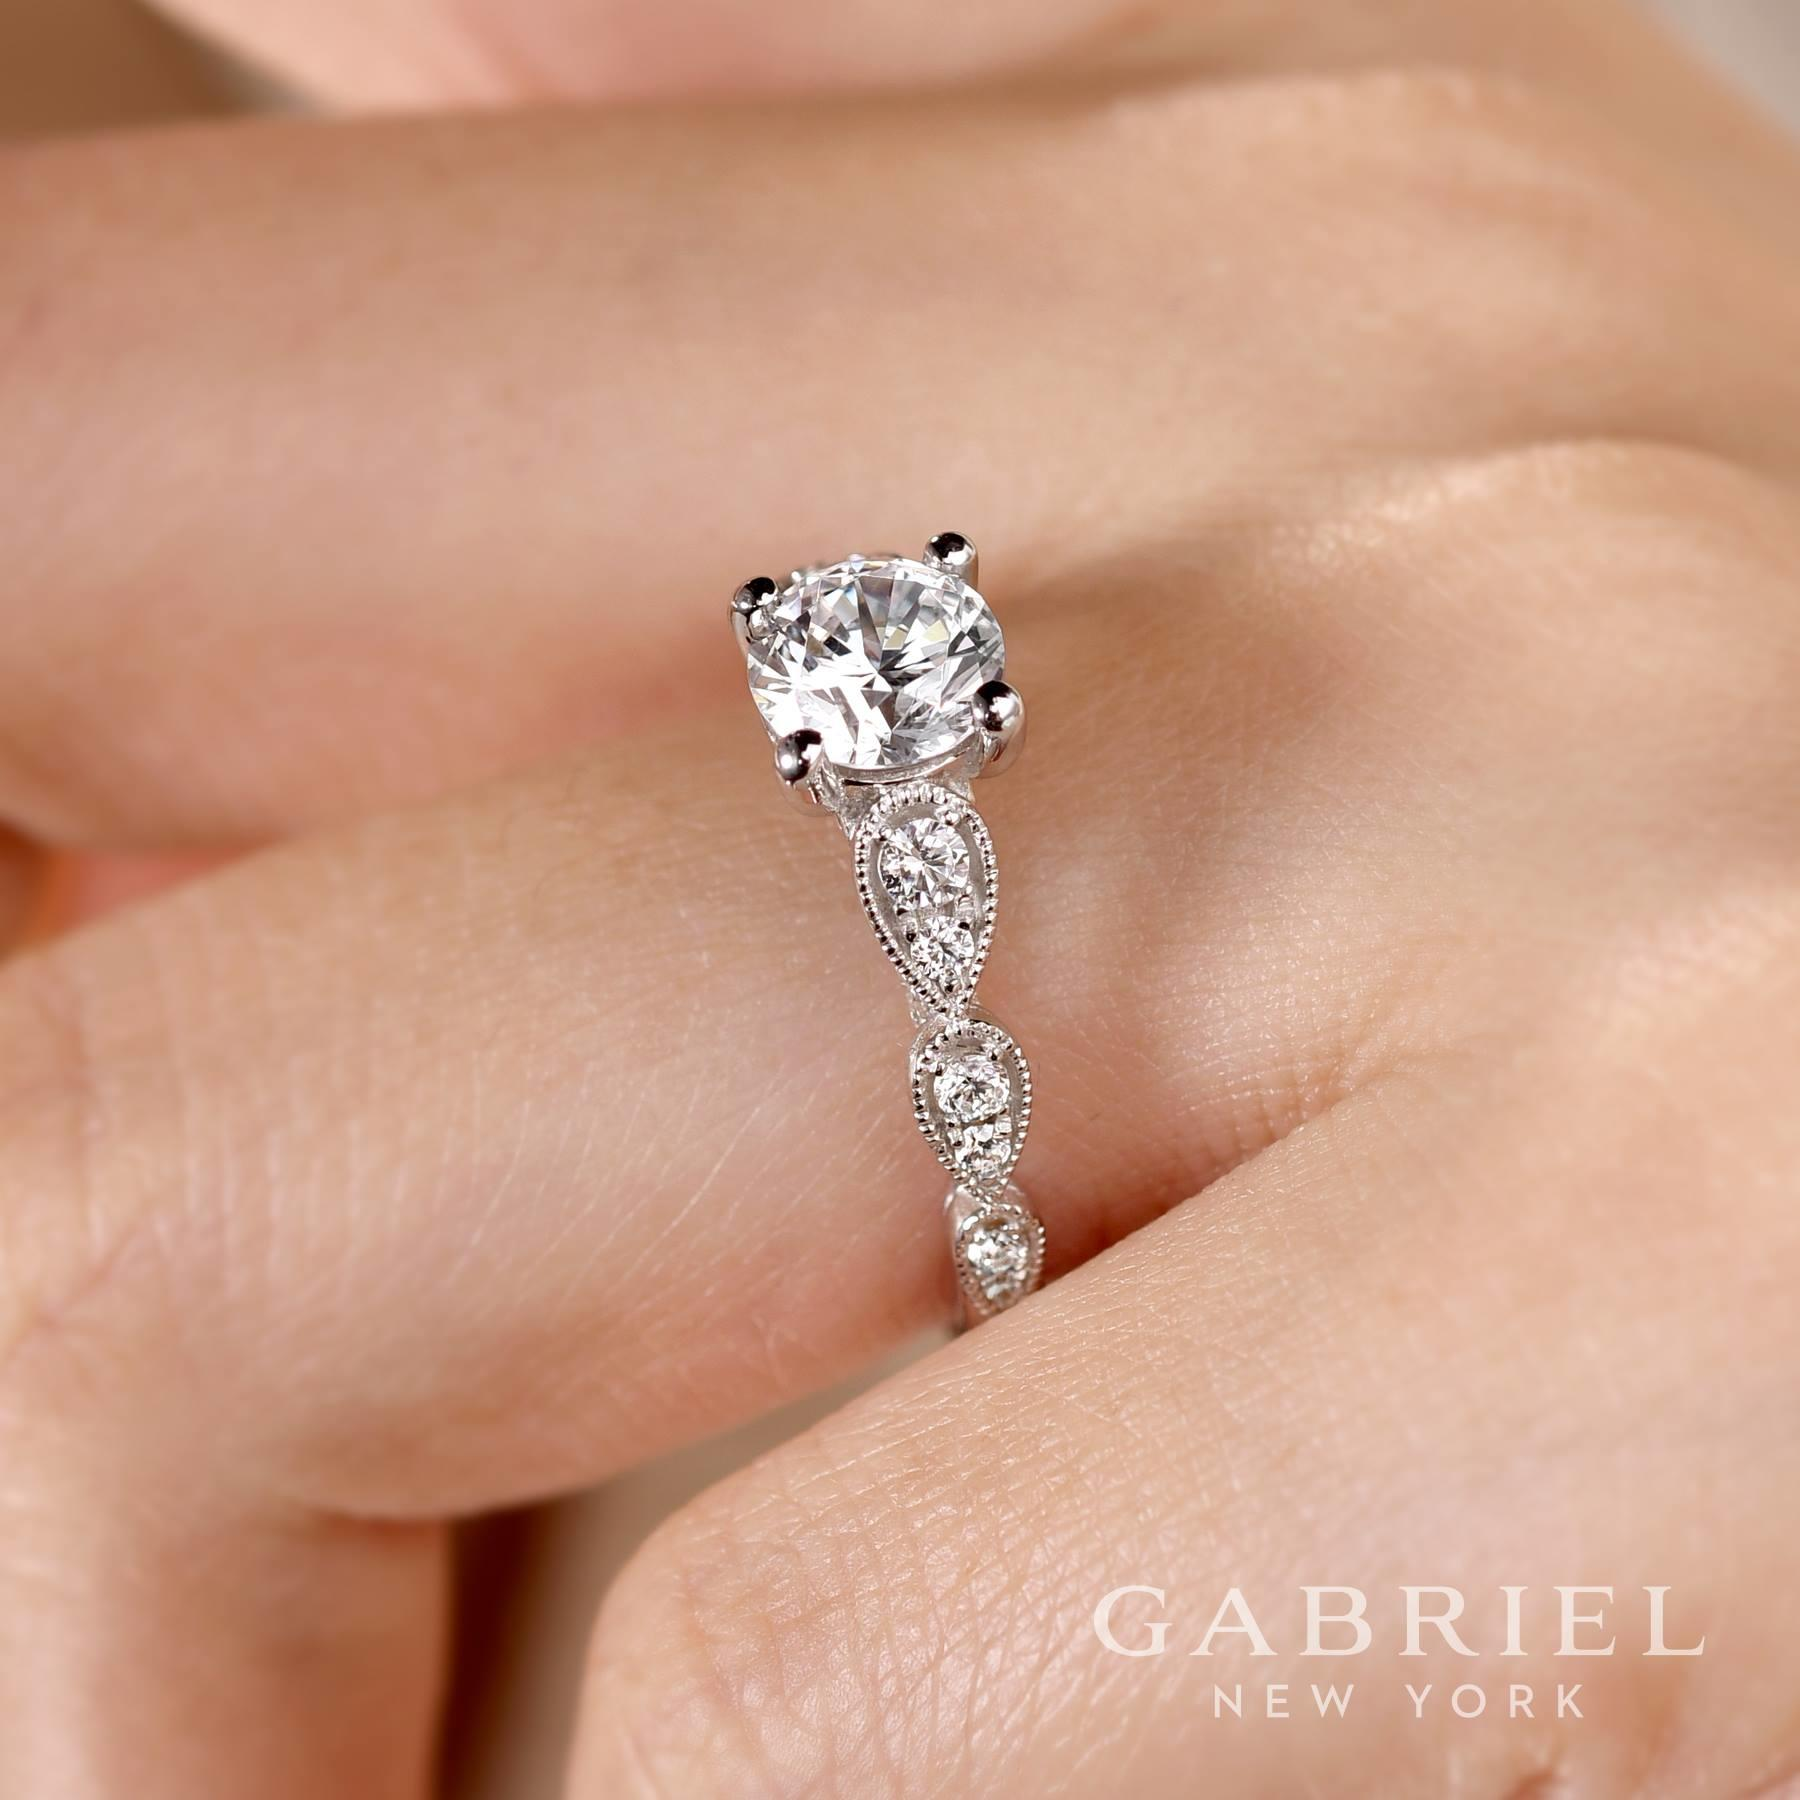 Emerald Lady Jewelry image 68